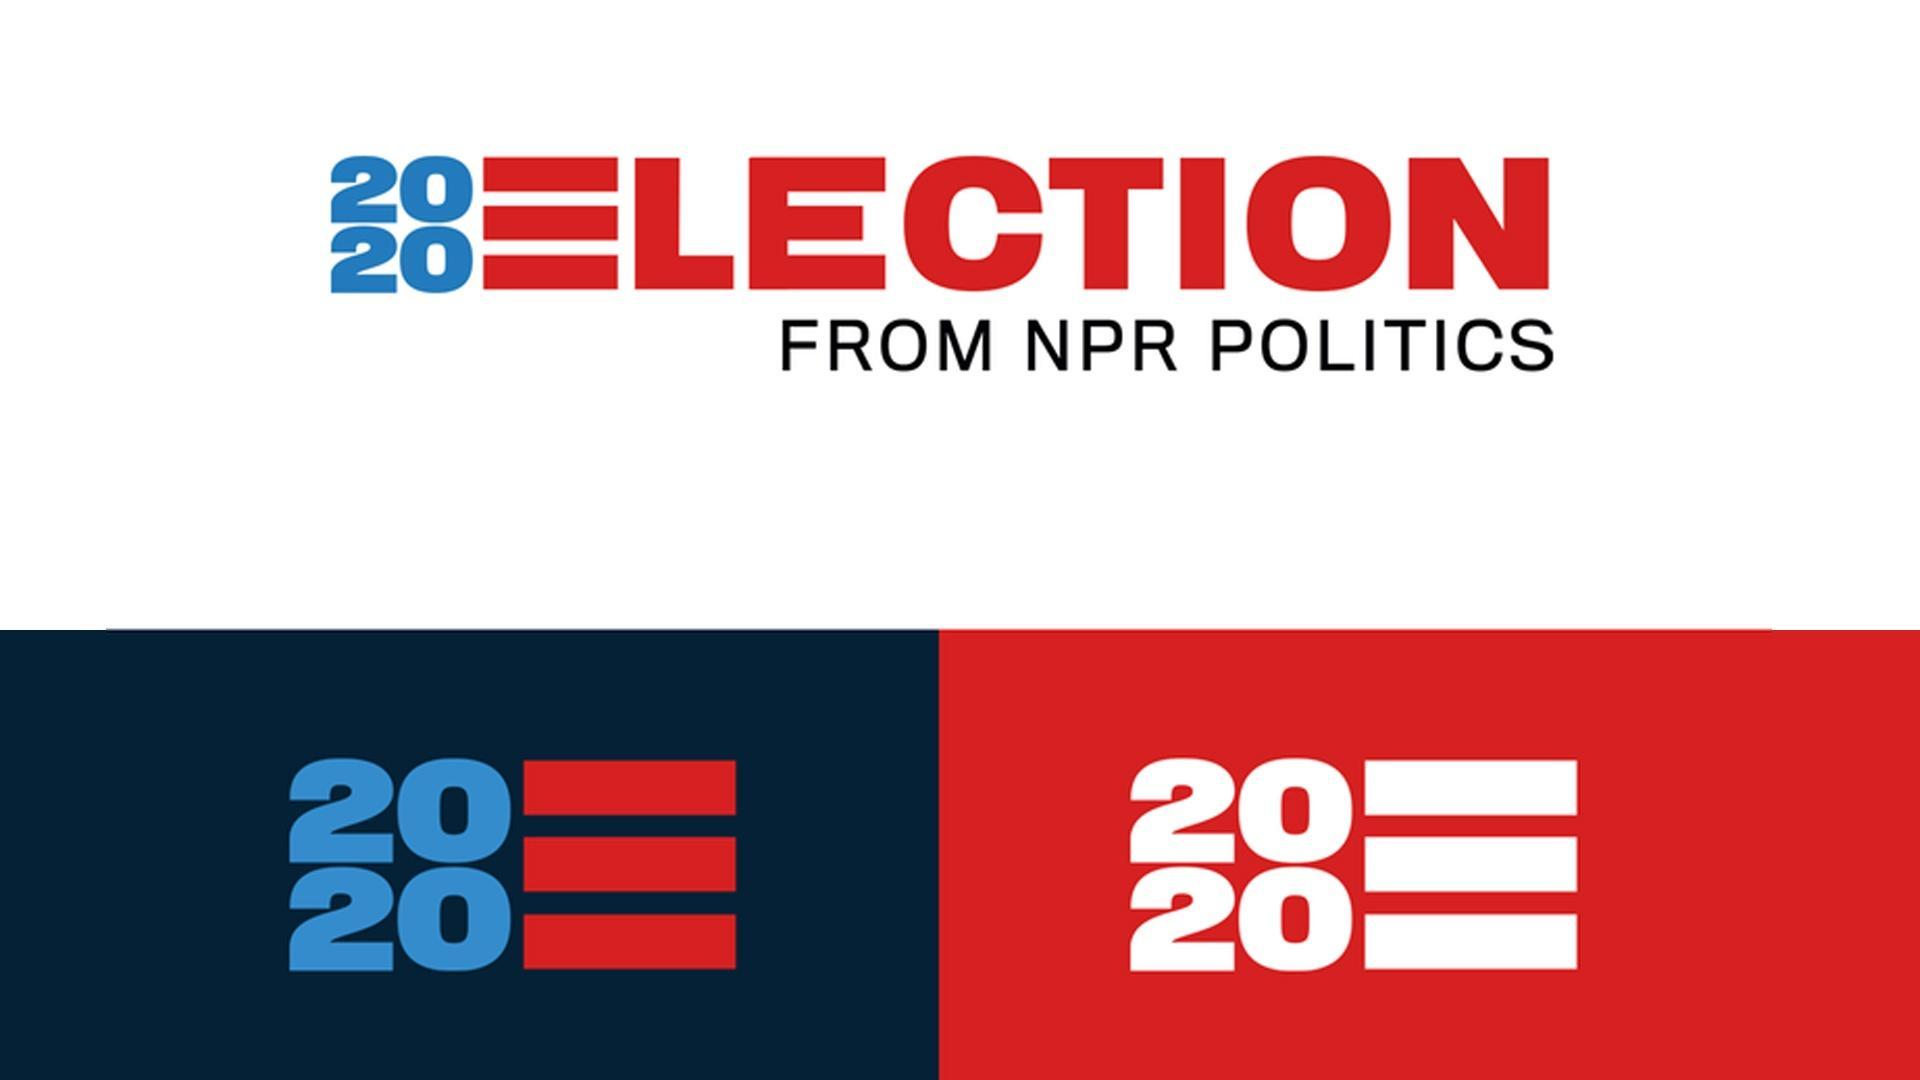 Election 2020 from NPR Politics